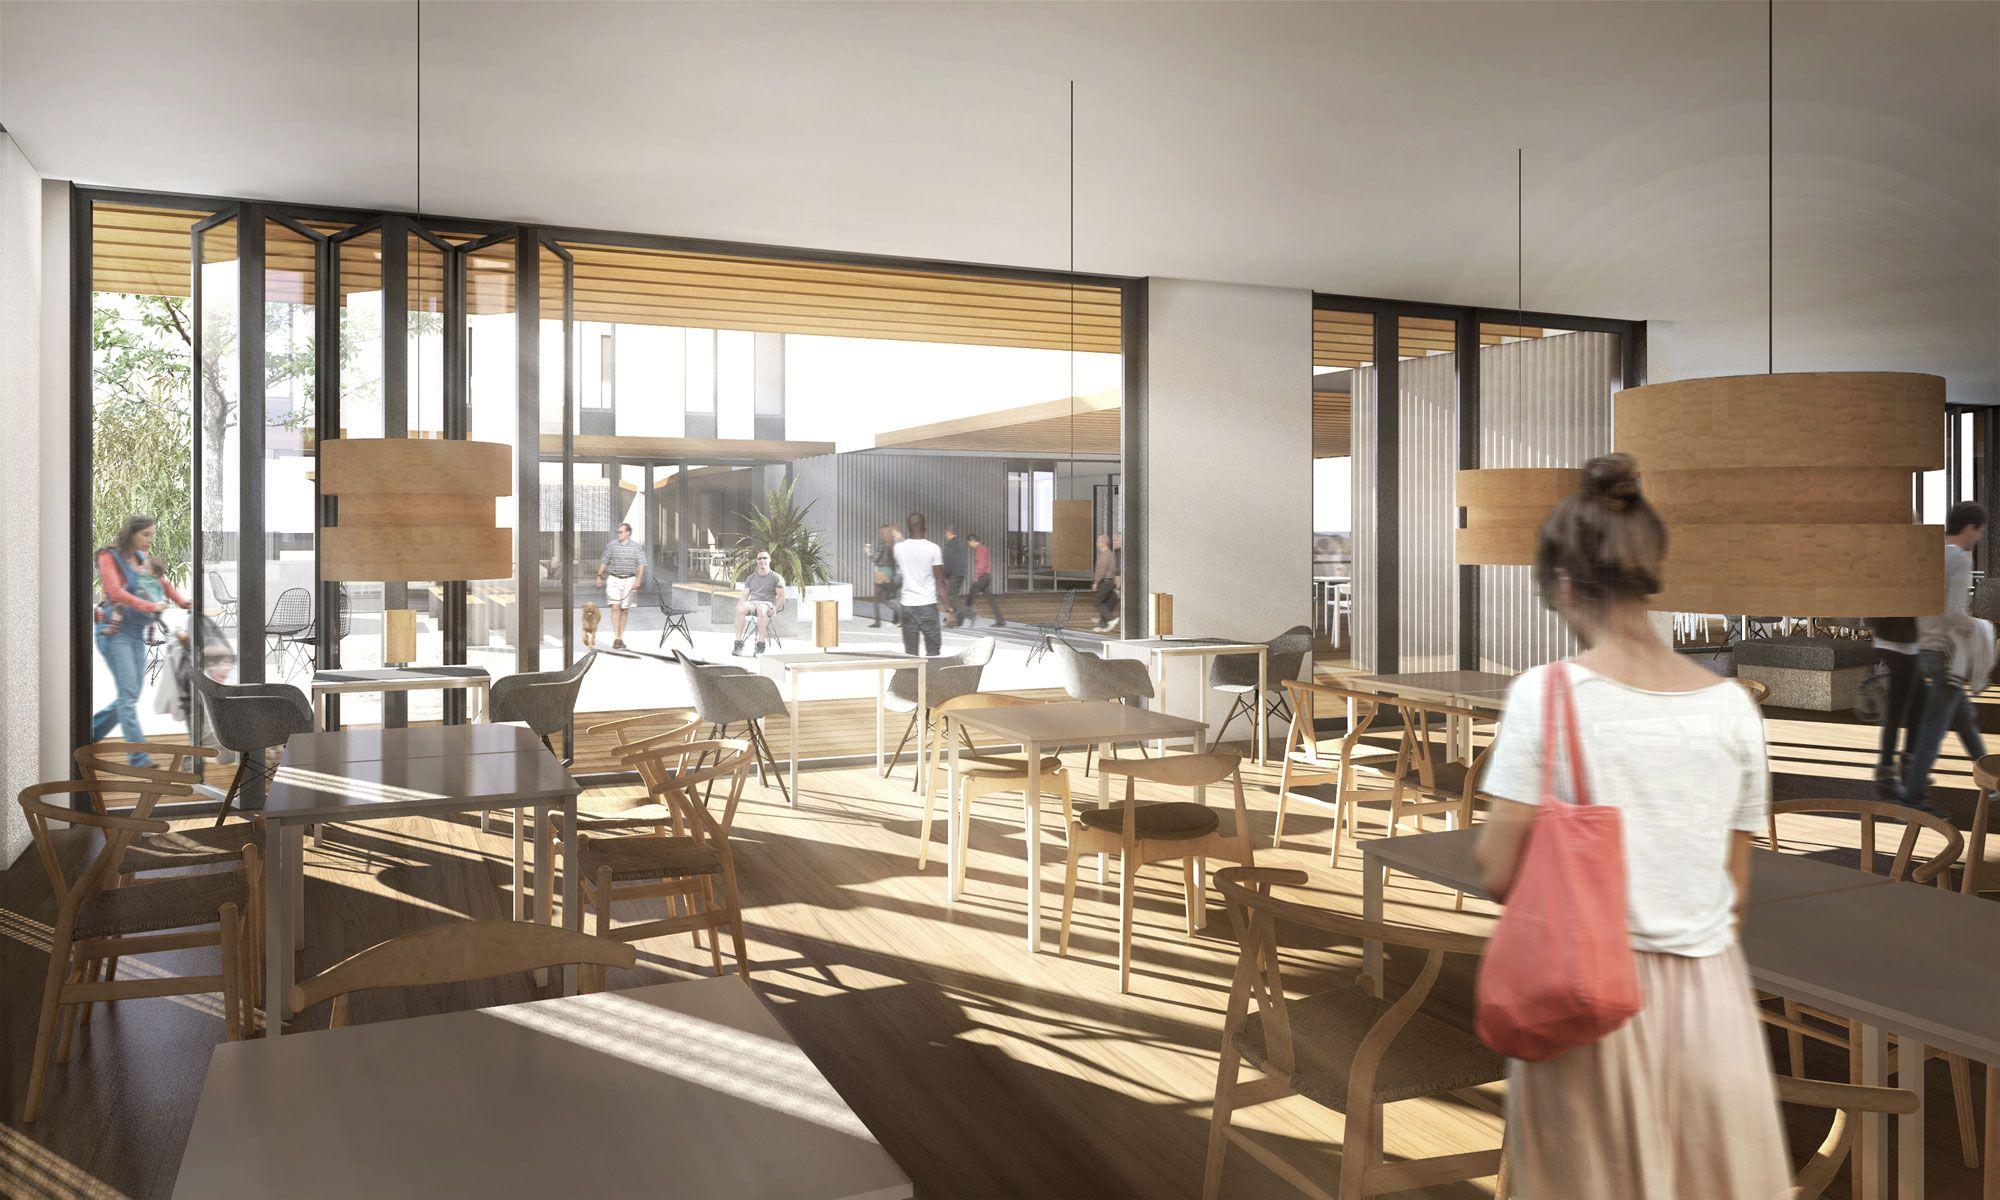 renders arquitectónicos para concursos de arquitectura